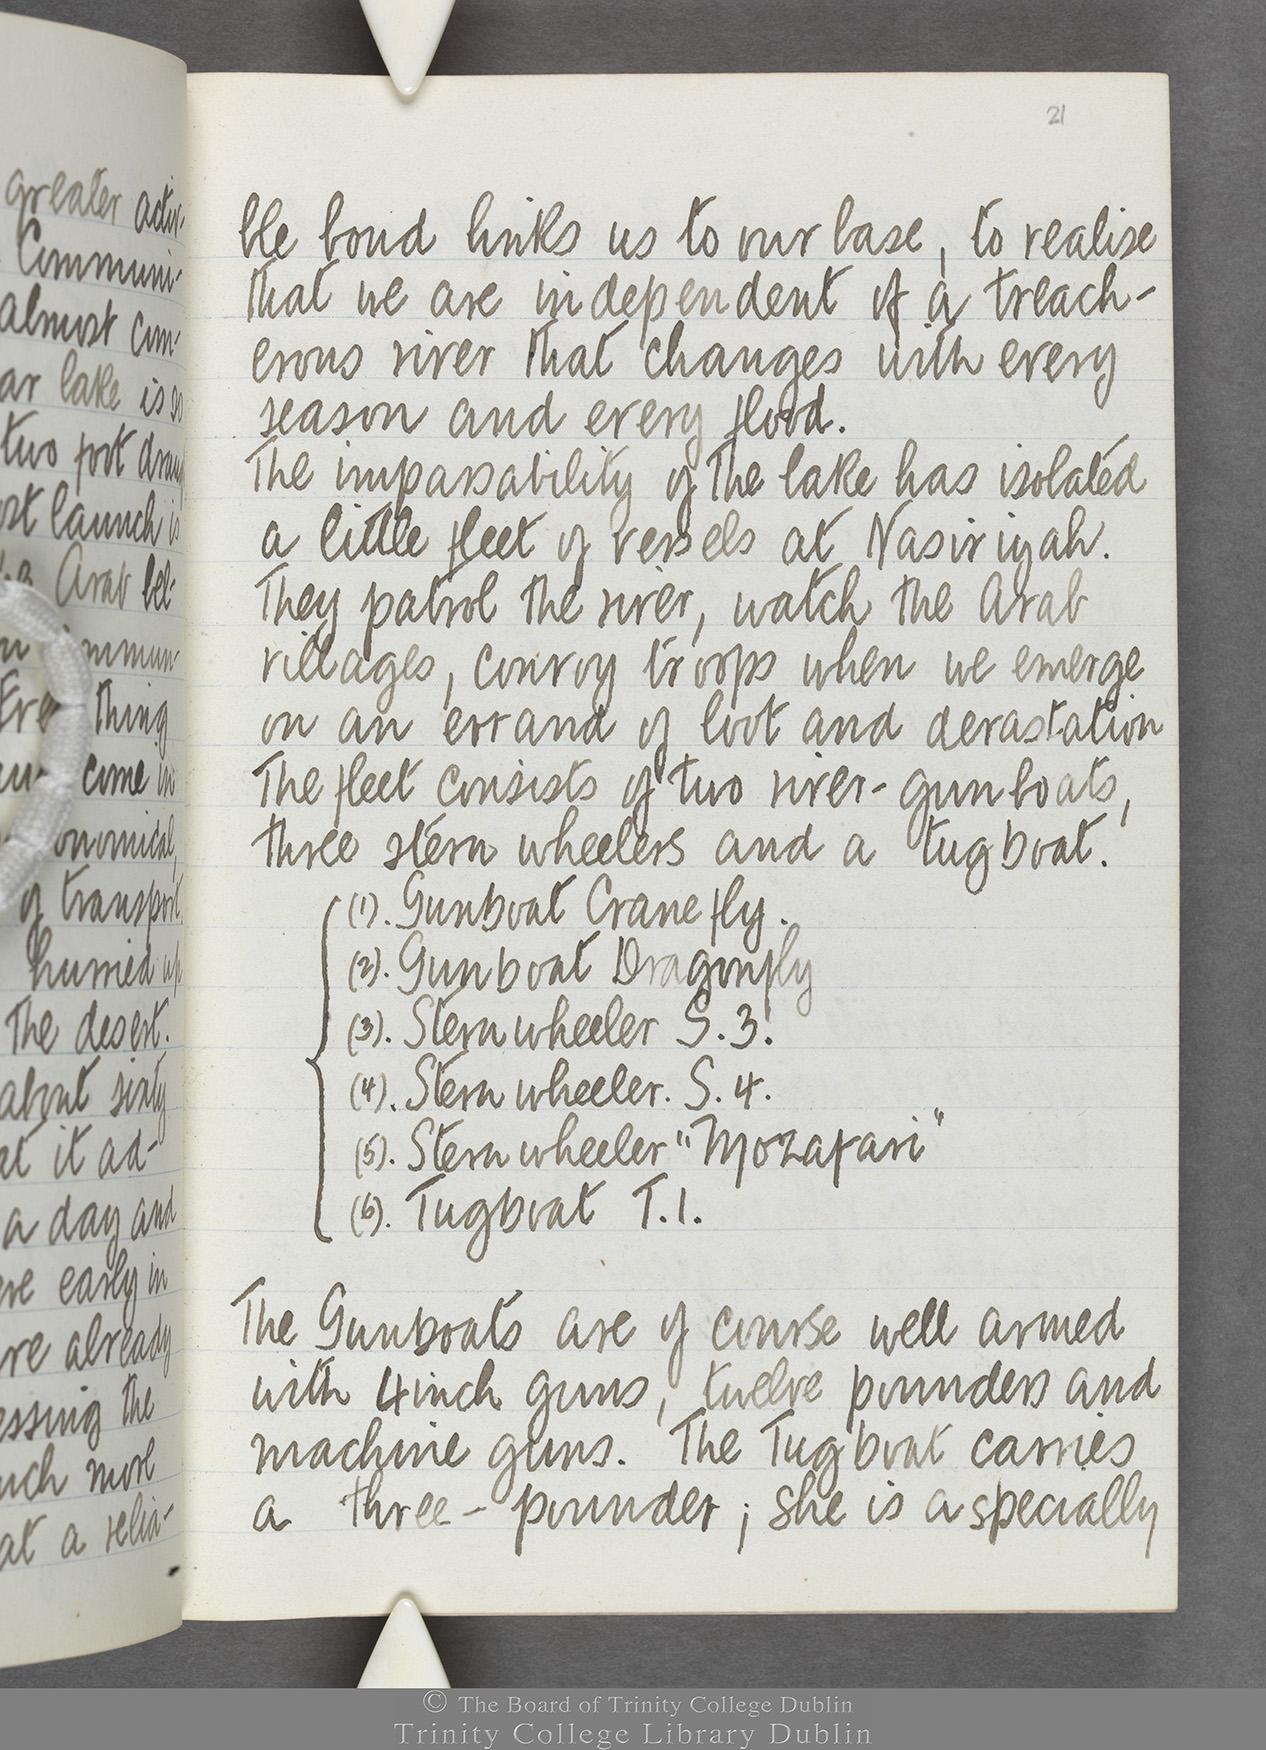 TCD MS 10516 folio 21 recto